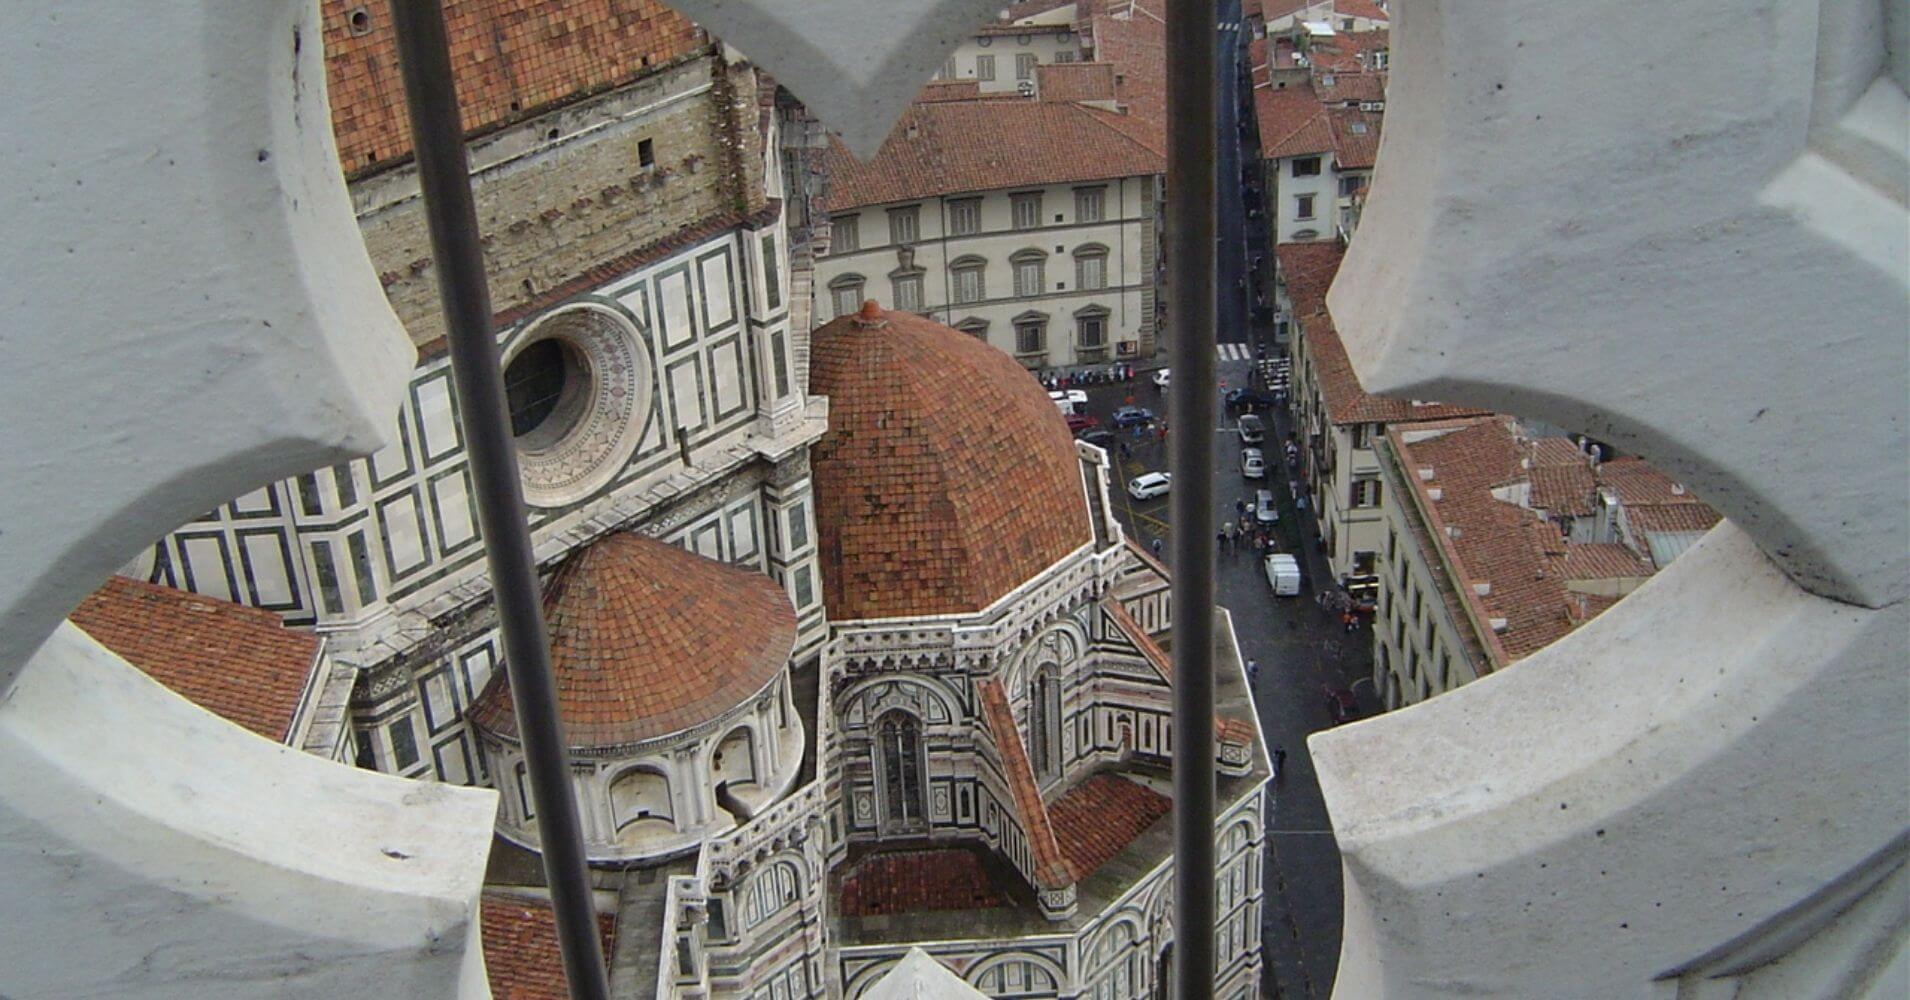 Detalle del Campanille. Florencia, Toscana. Italia.